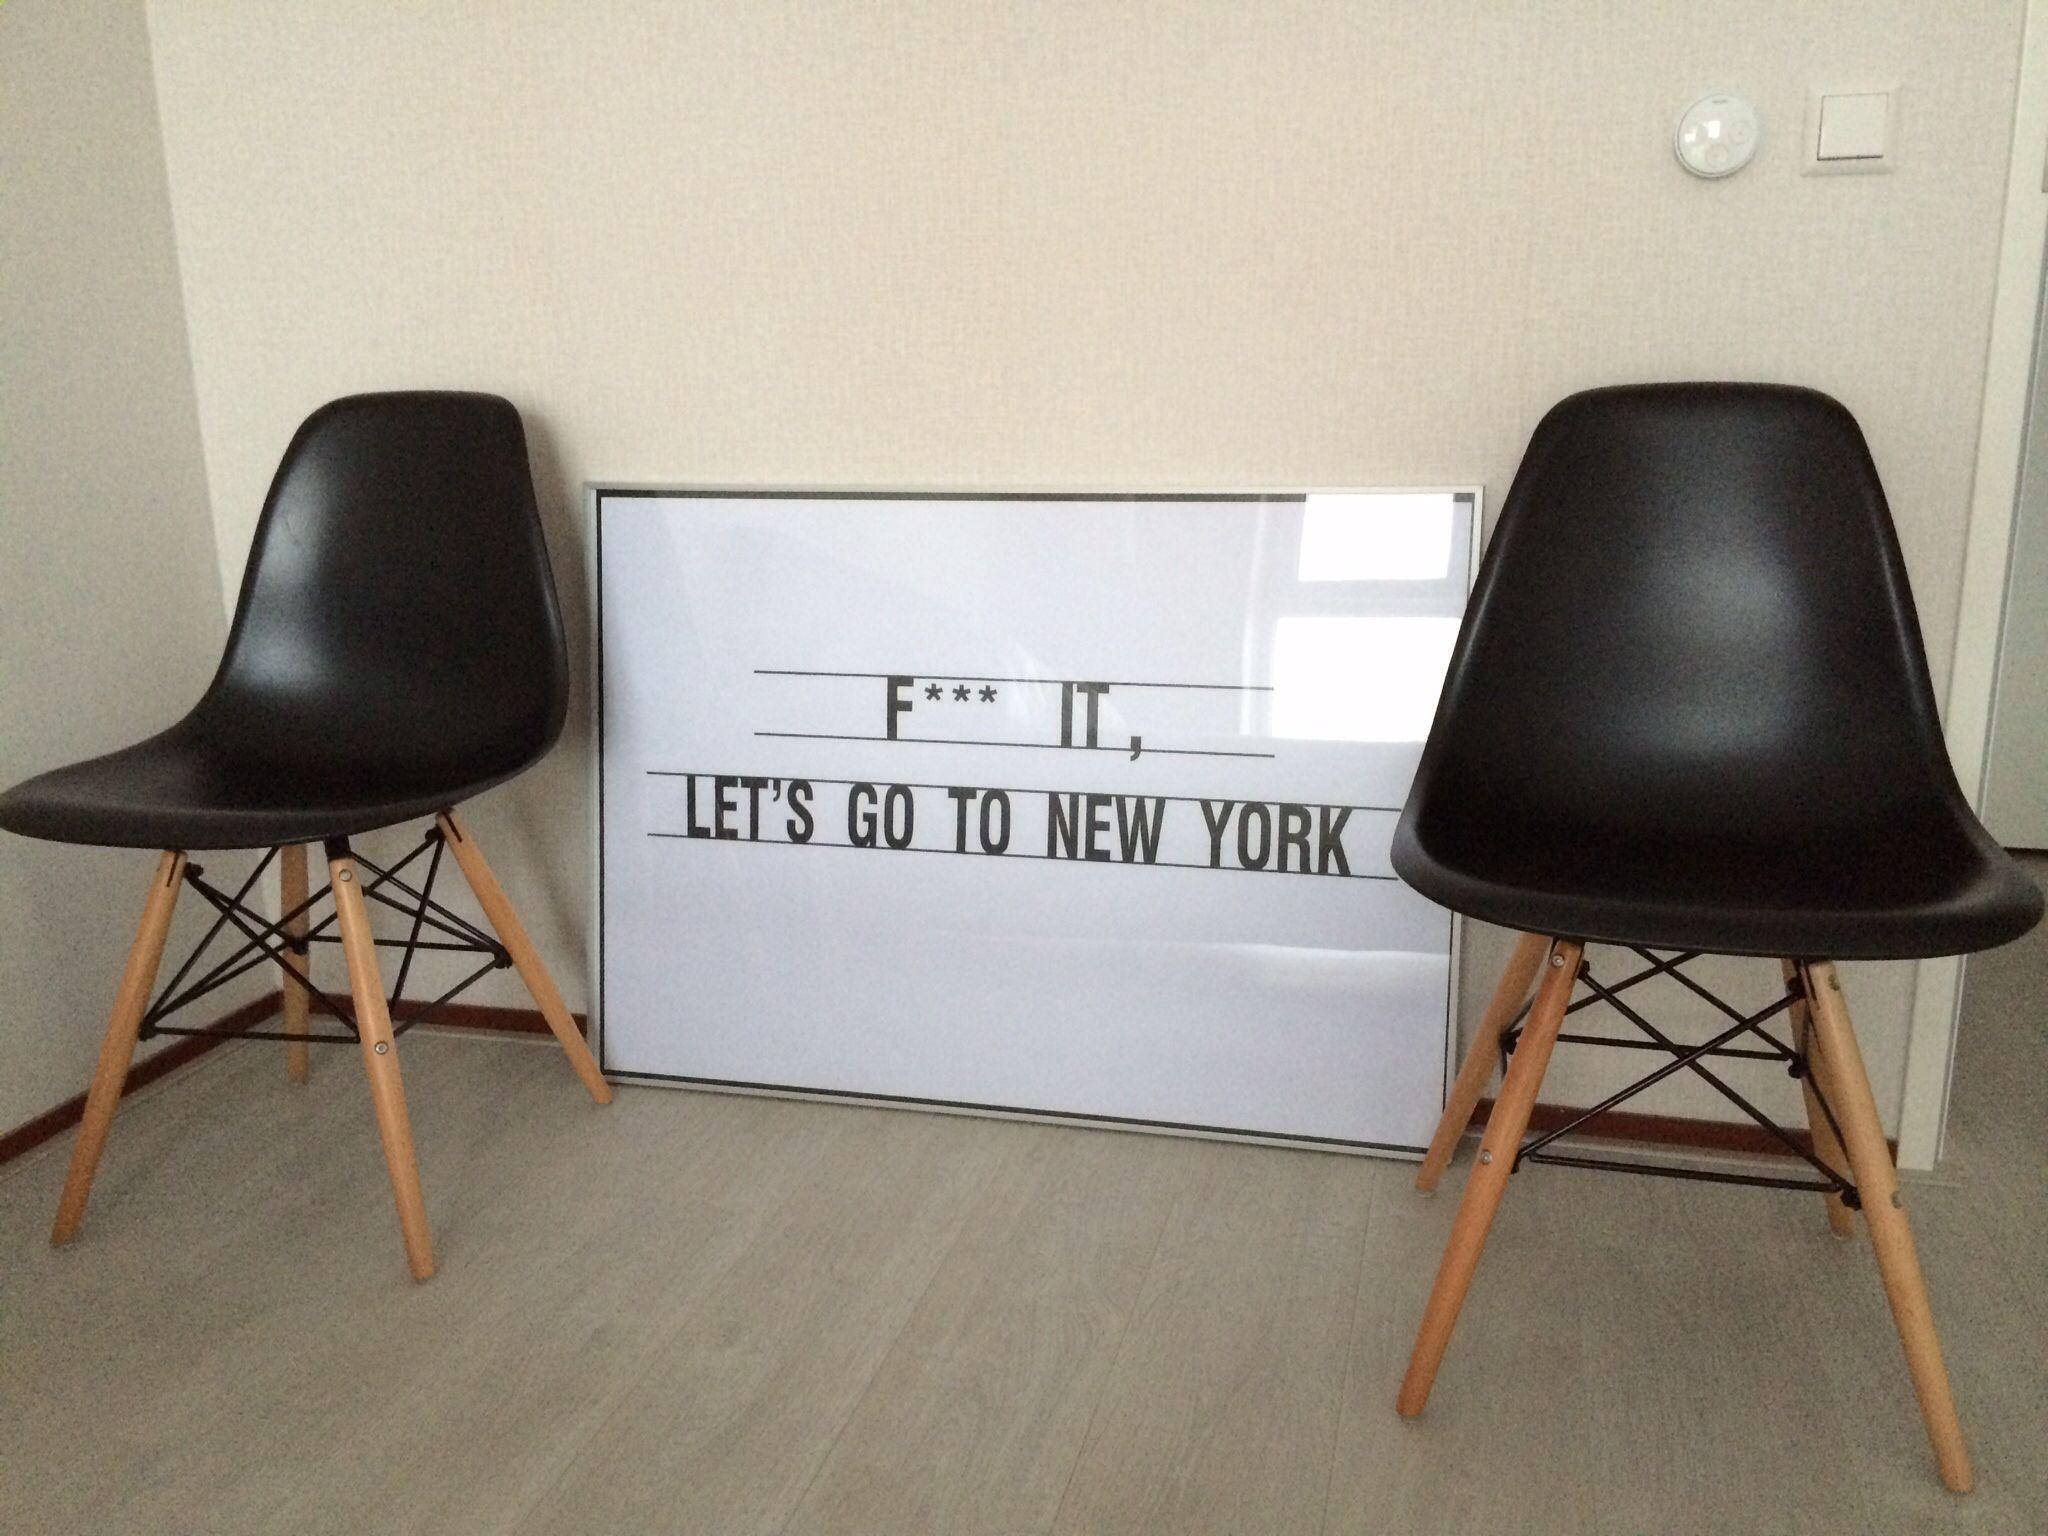 Eames lookalike stoelen paris kuipstoel van kwantum 29 for Eames kuipstoel